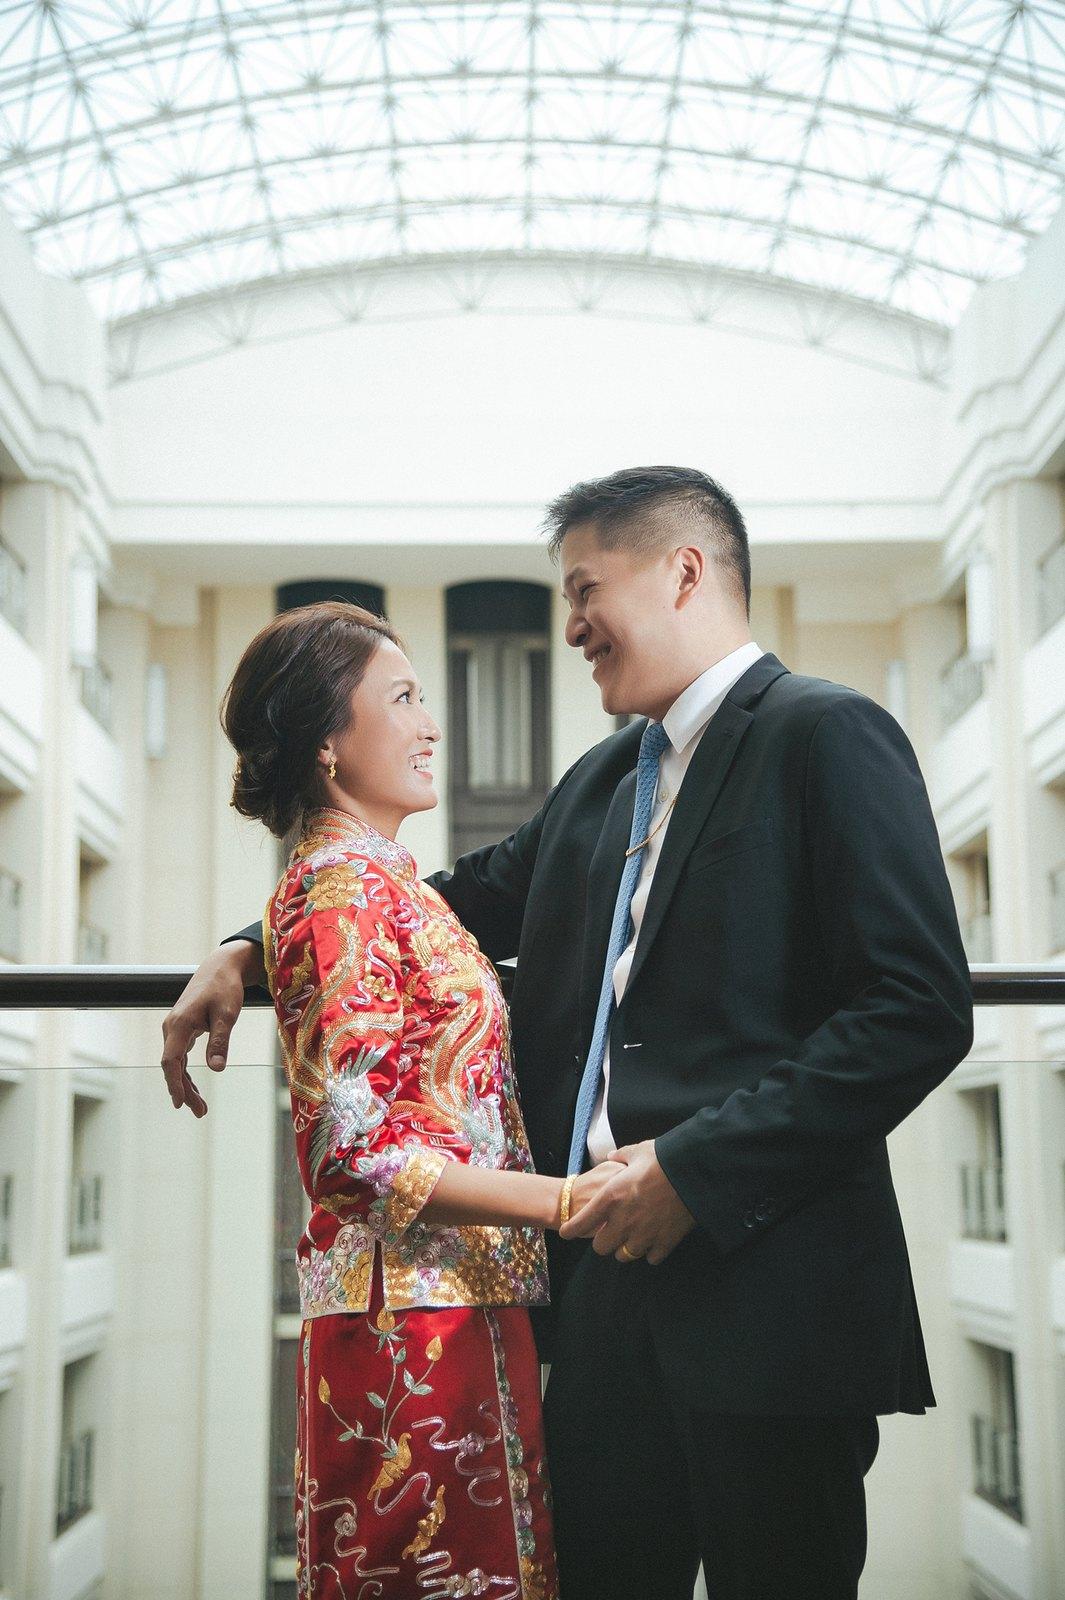 【婚攝】Robert & Allyson / 台南大億麗緻酒店 / Tayih Landis Tainan